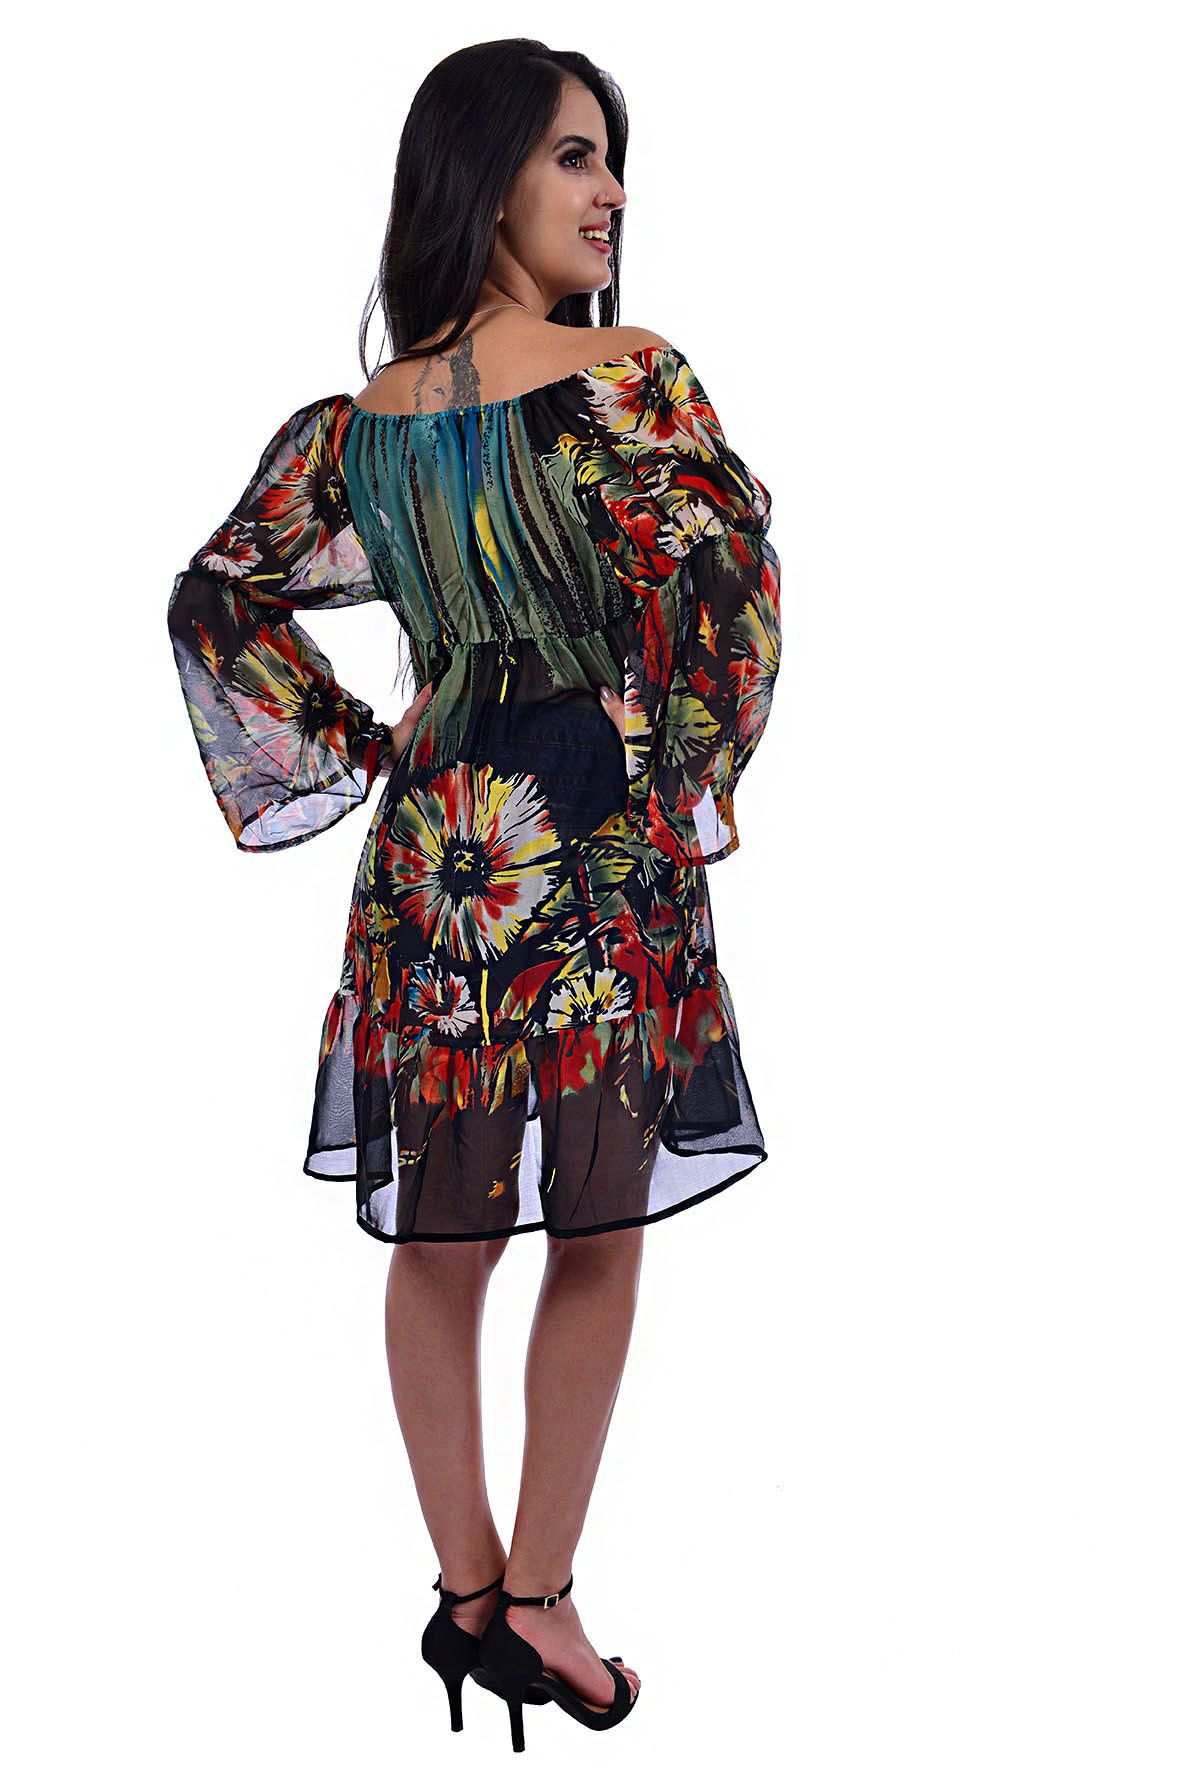 Vestido Ombro a Ombro com Pedraria no Decote Floral